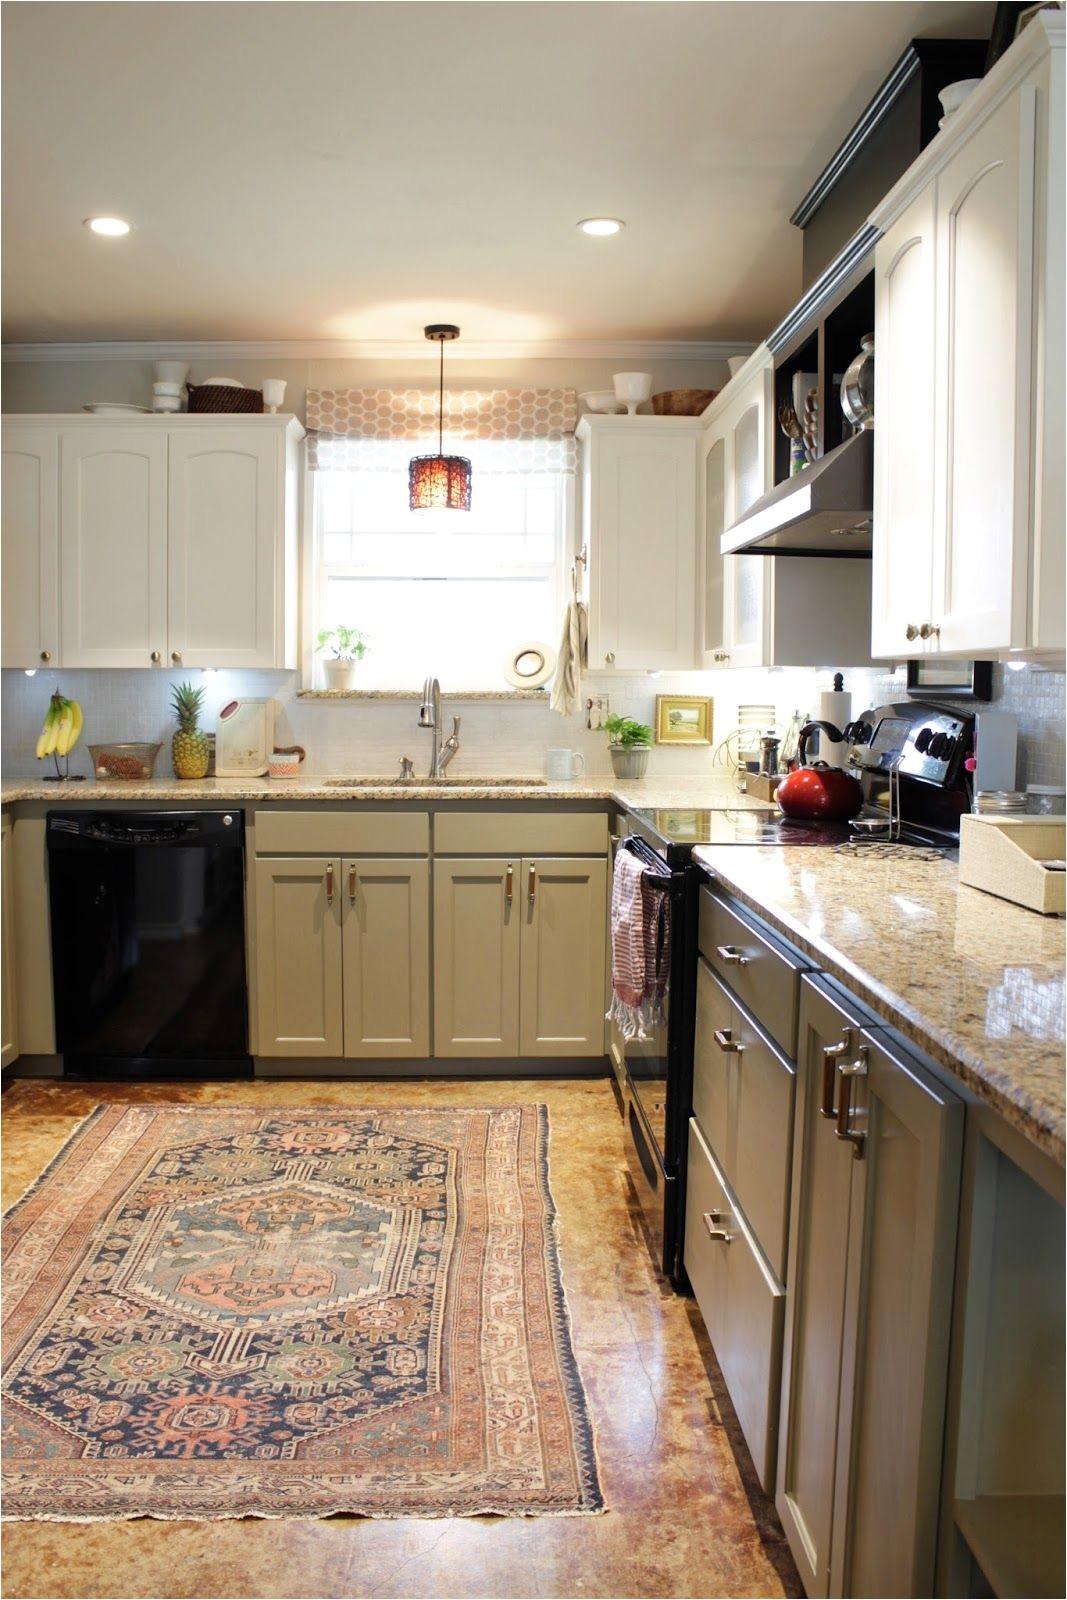 Chris Custom Cabinets Nashville New Chalk Painted Kitchen Cabinets 4 Years Later Chalk Paint Kitchen